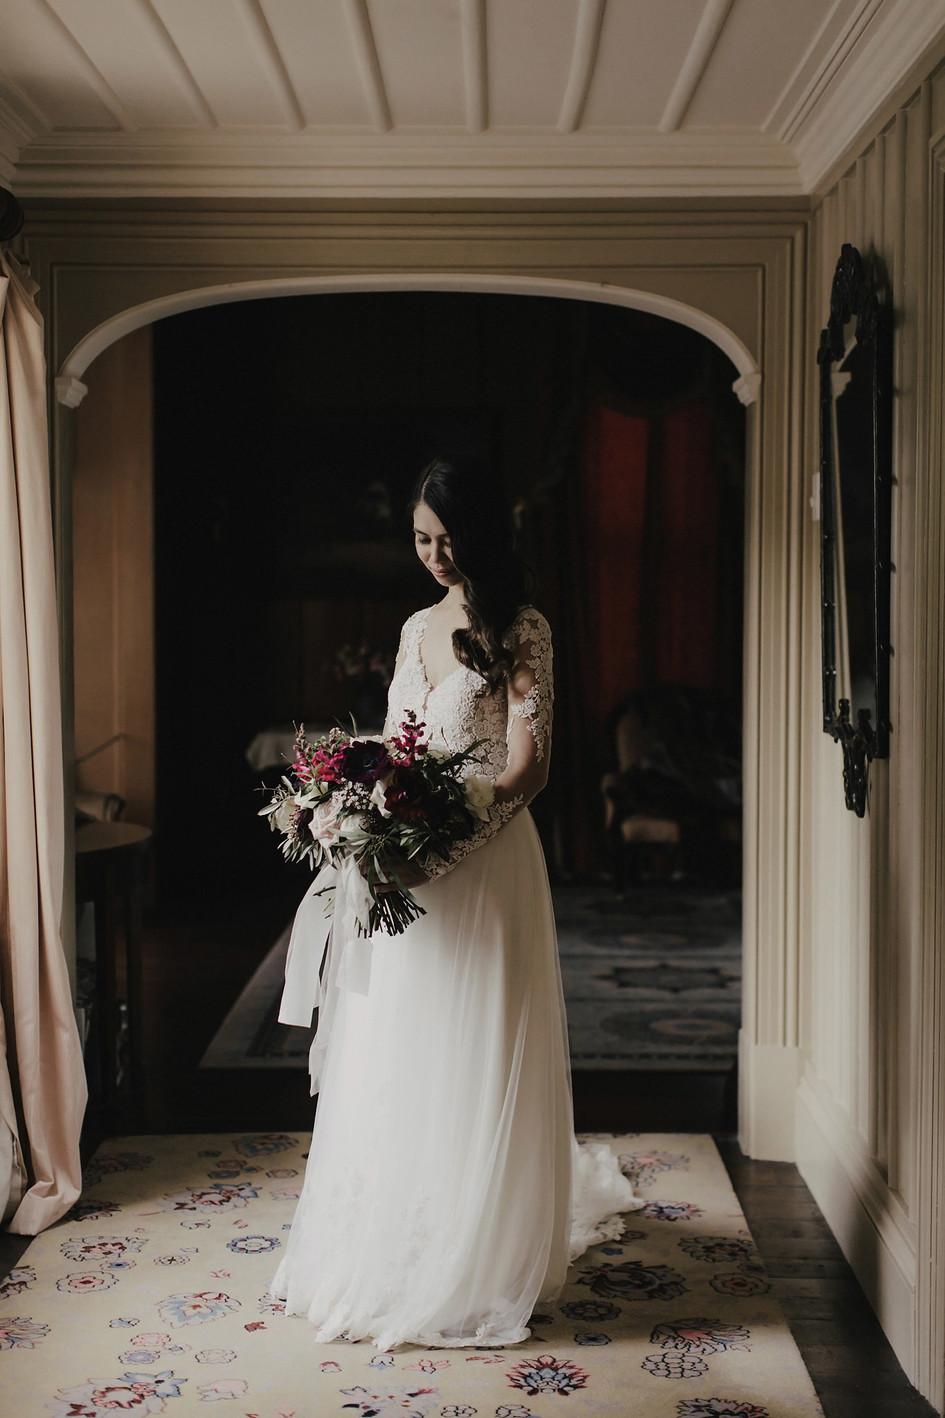 danelle_bohane_wedding_photography.jpg